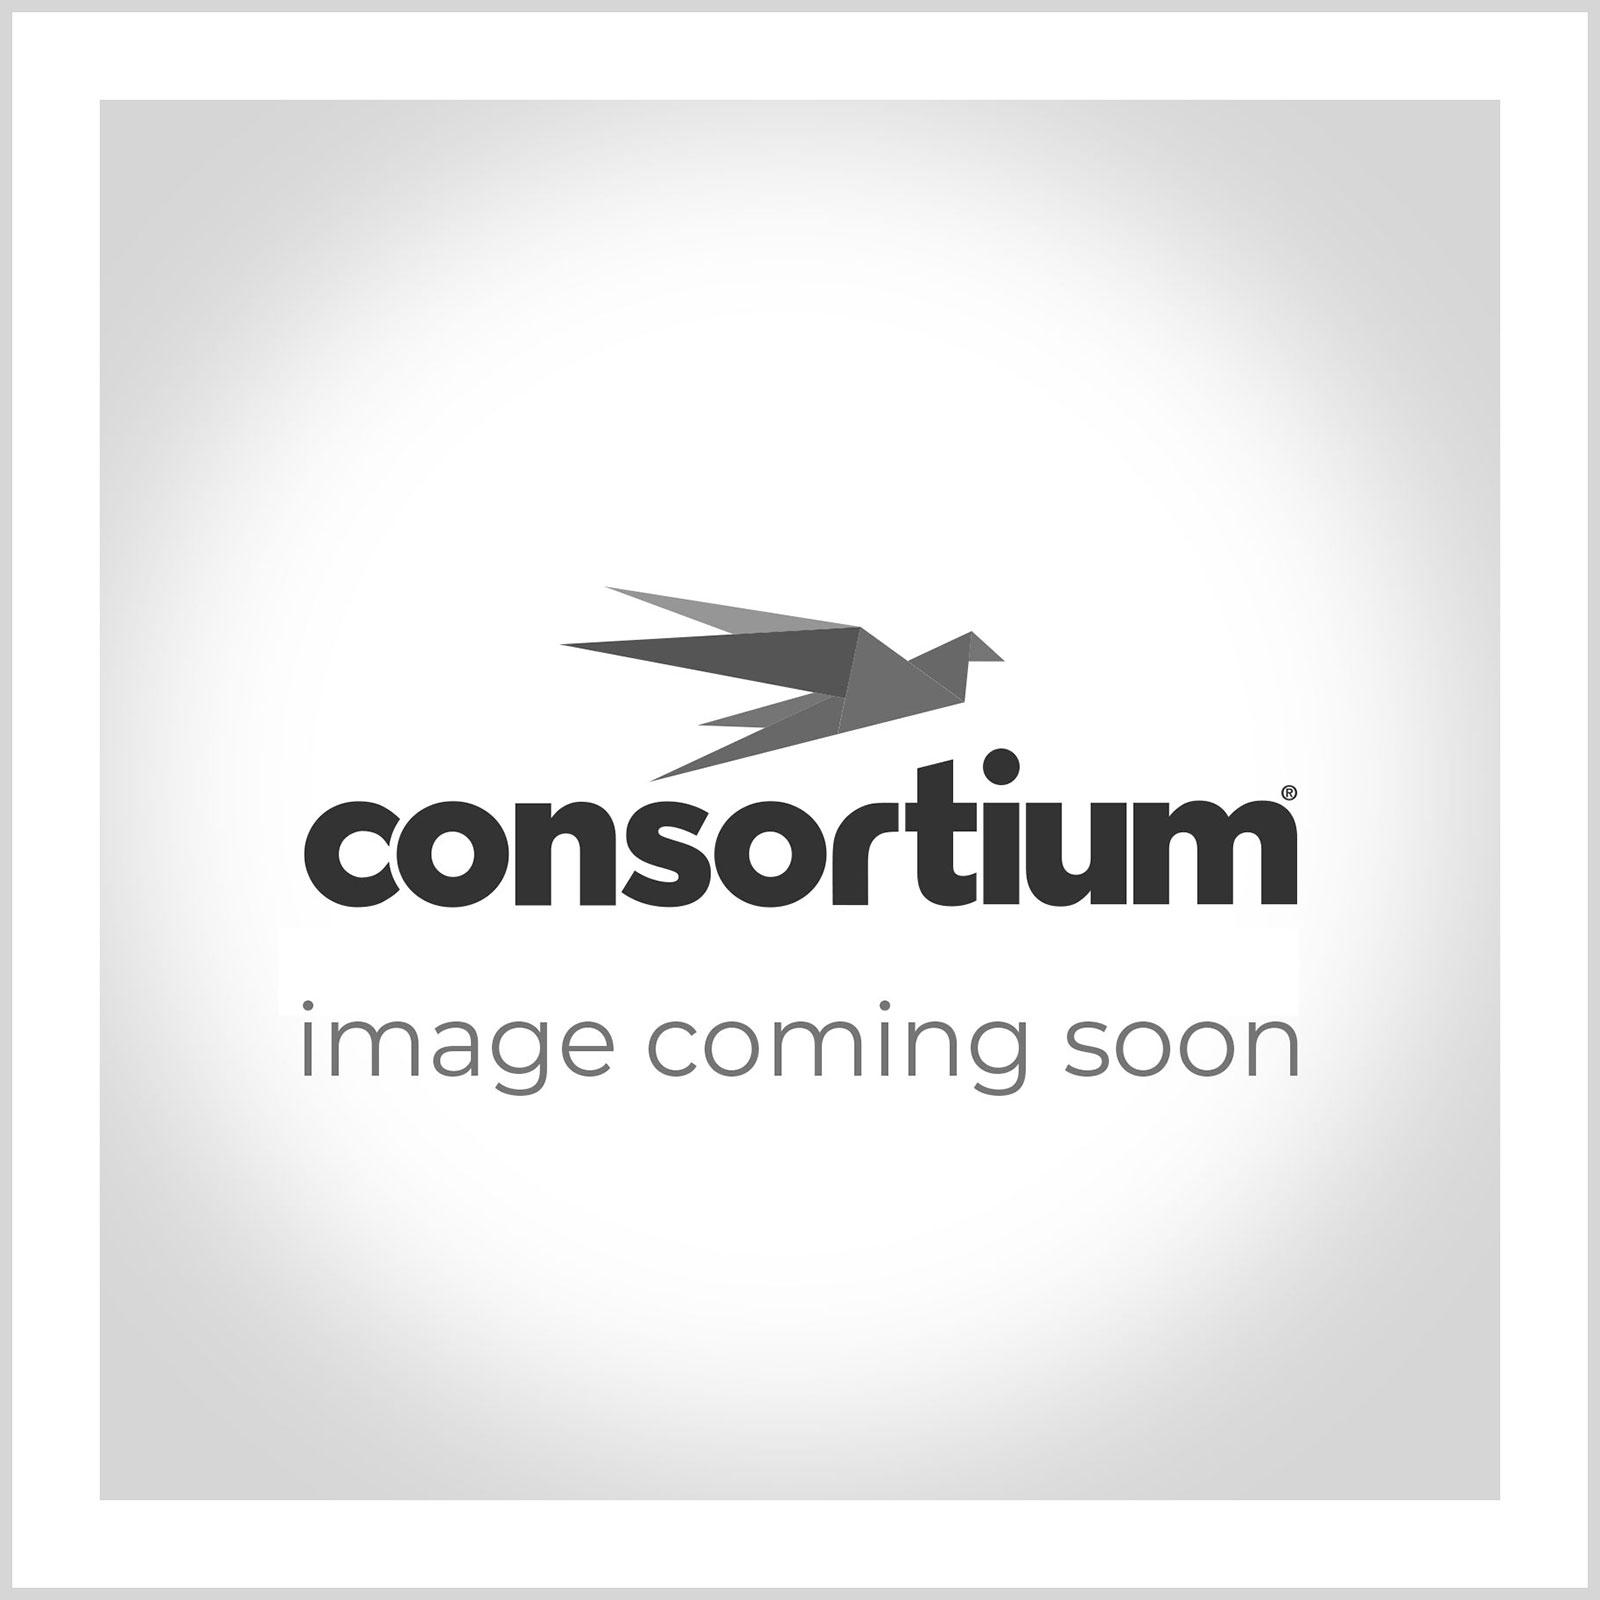 Consortium Thin Art Card